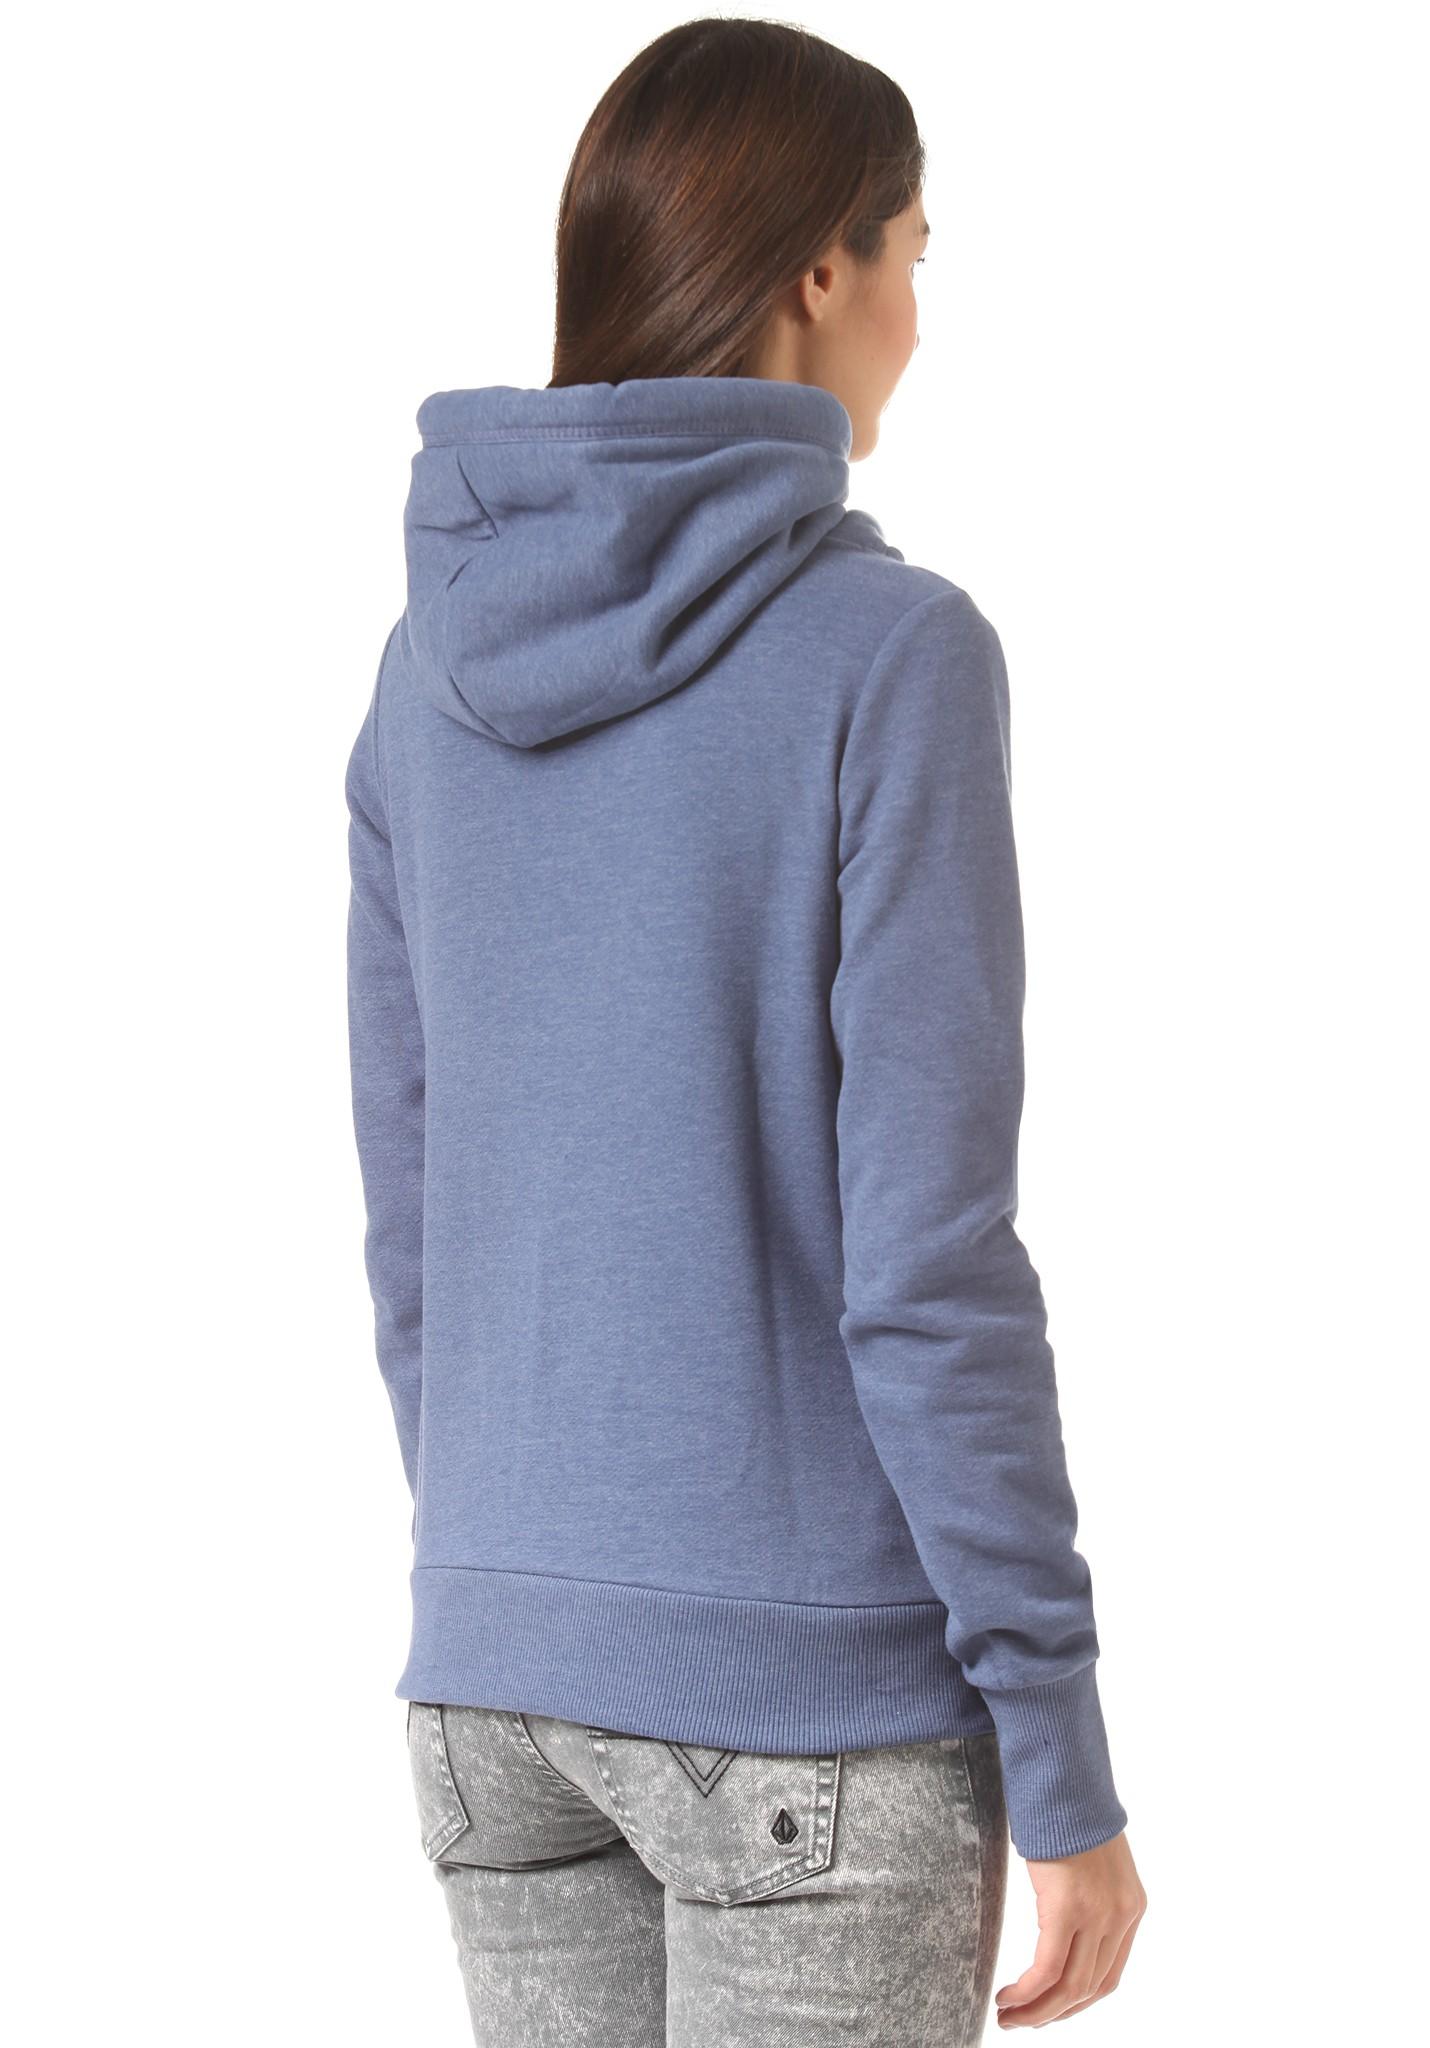 neu naketano trust my rage damen kapuzenpullover pullover hoodie kapuzenjacke ebay. Black Bedroom Furniture Sets. Home Design Ideas